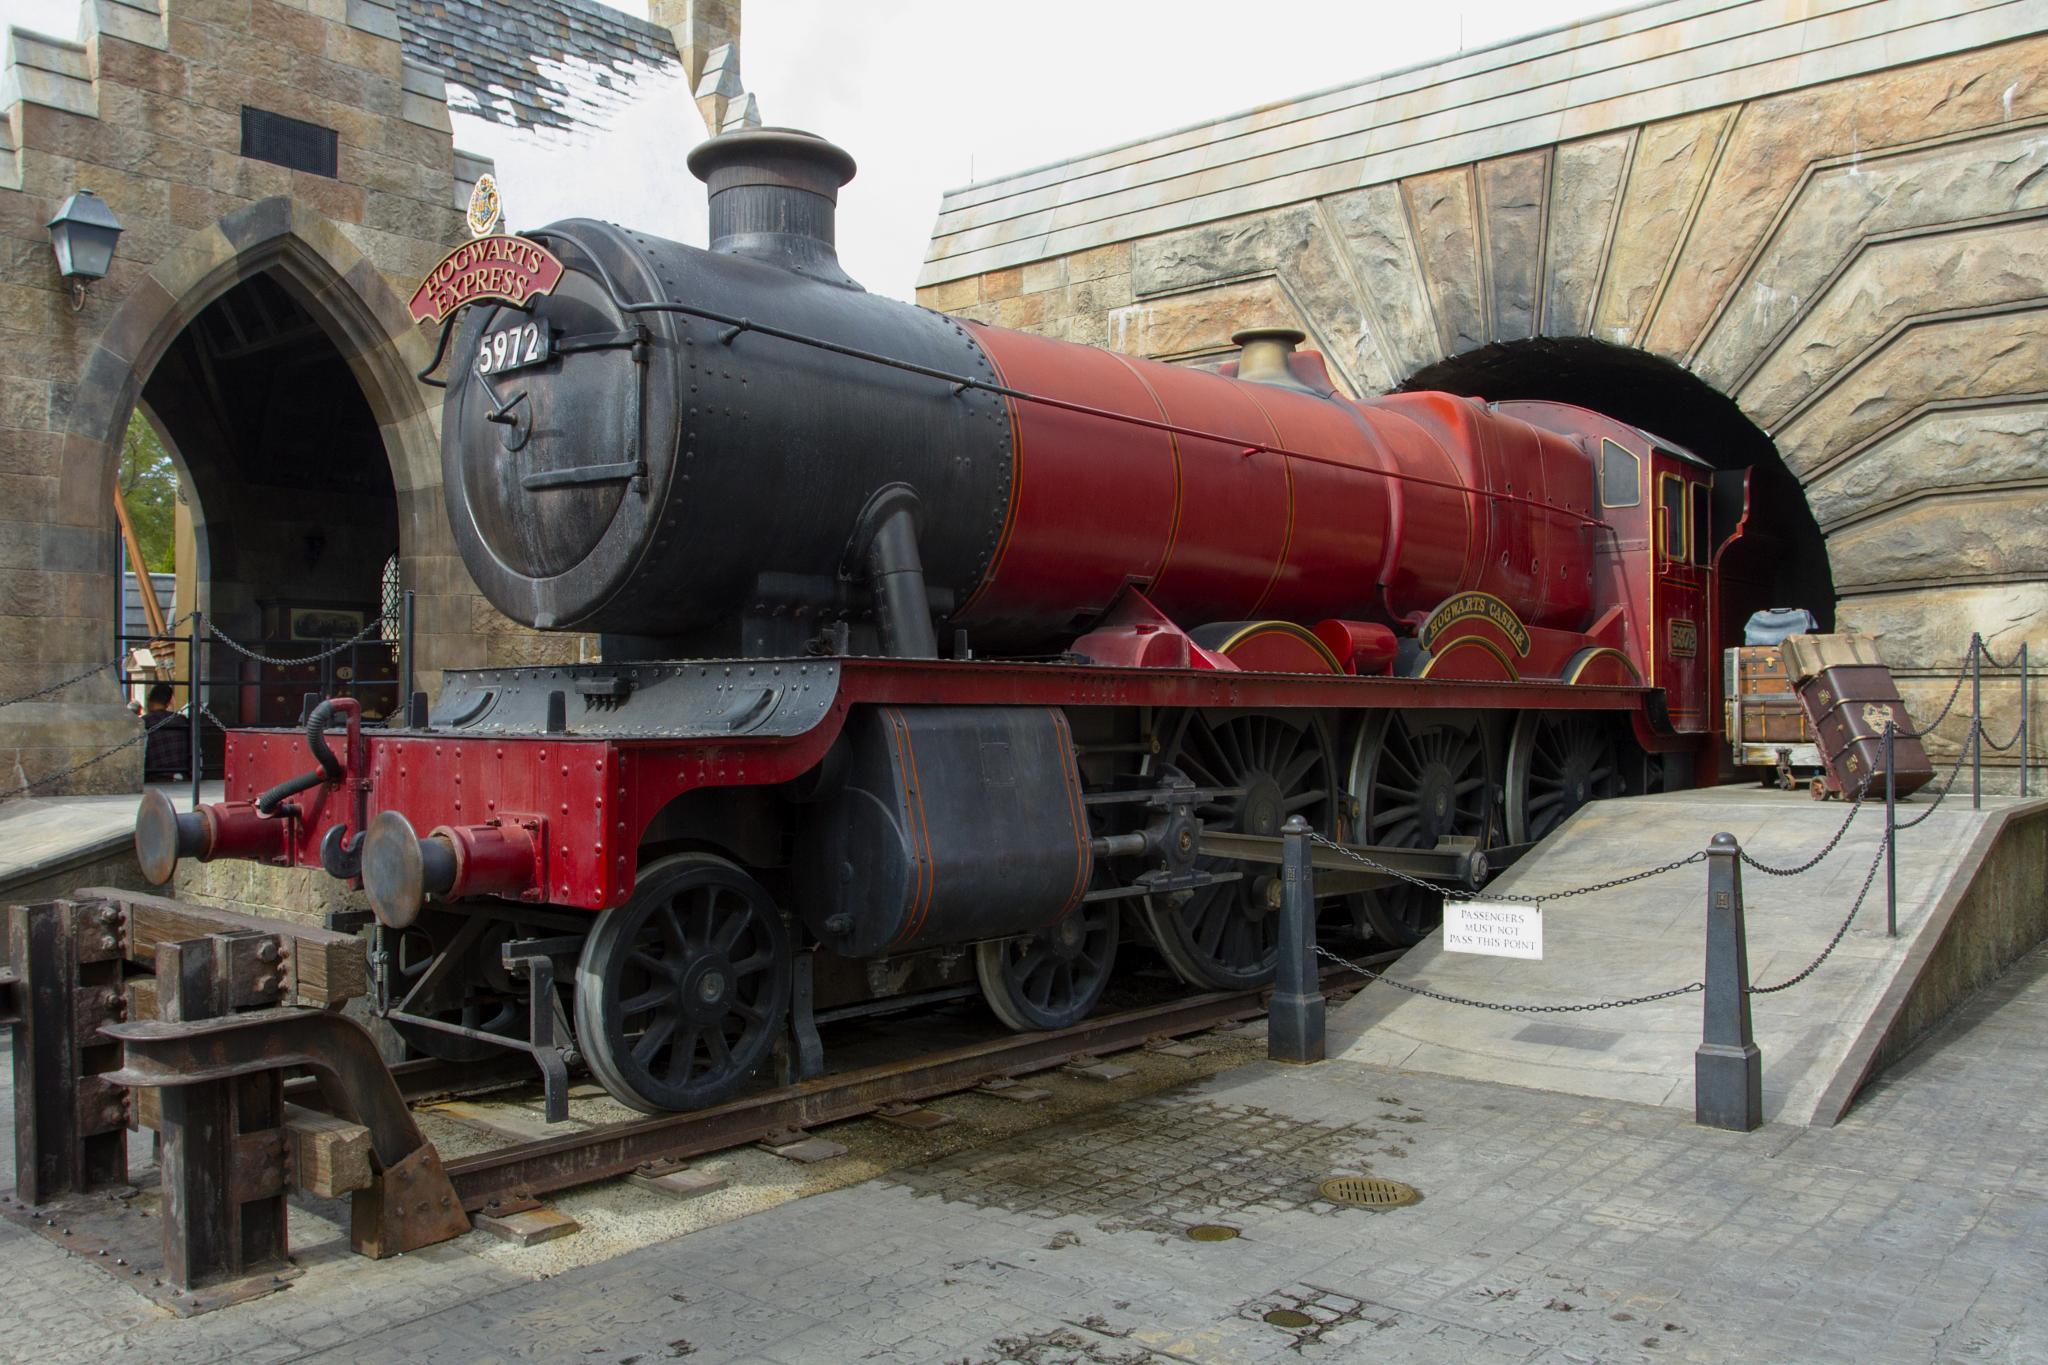 Hogwarts Express by Joe Chrvala